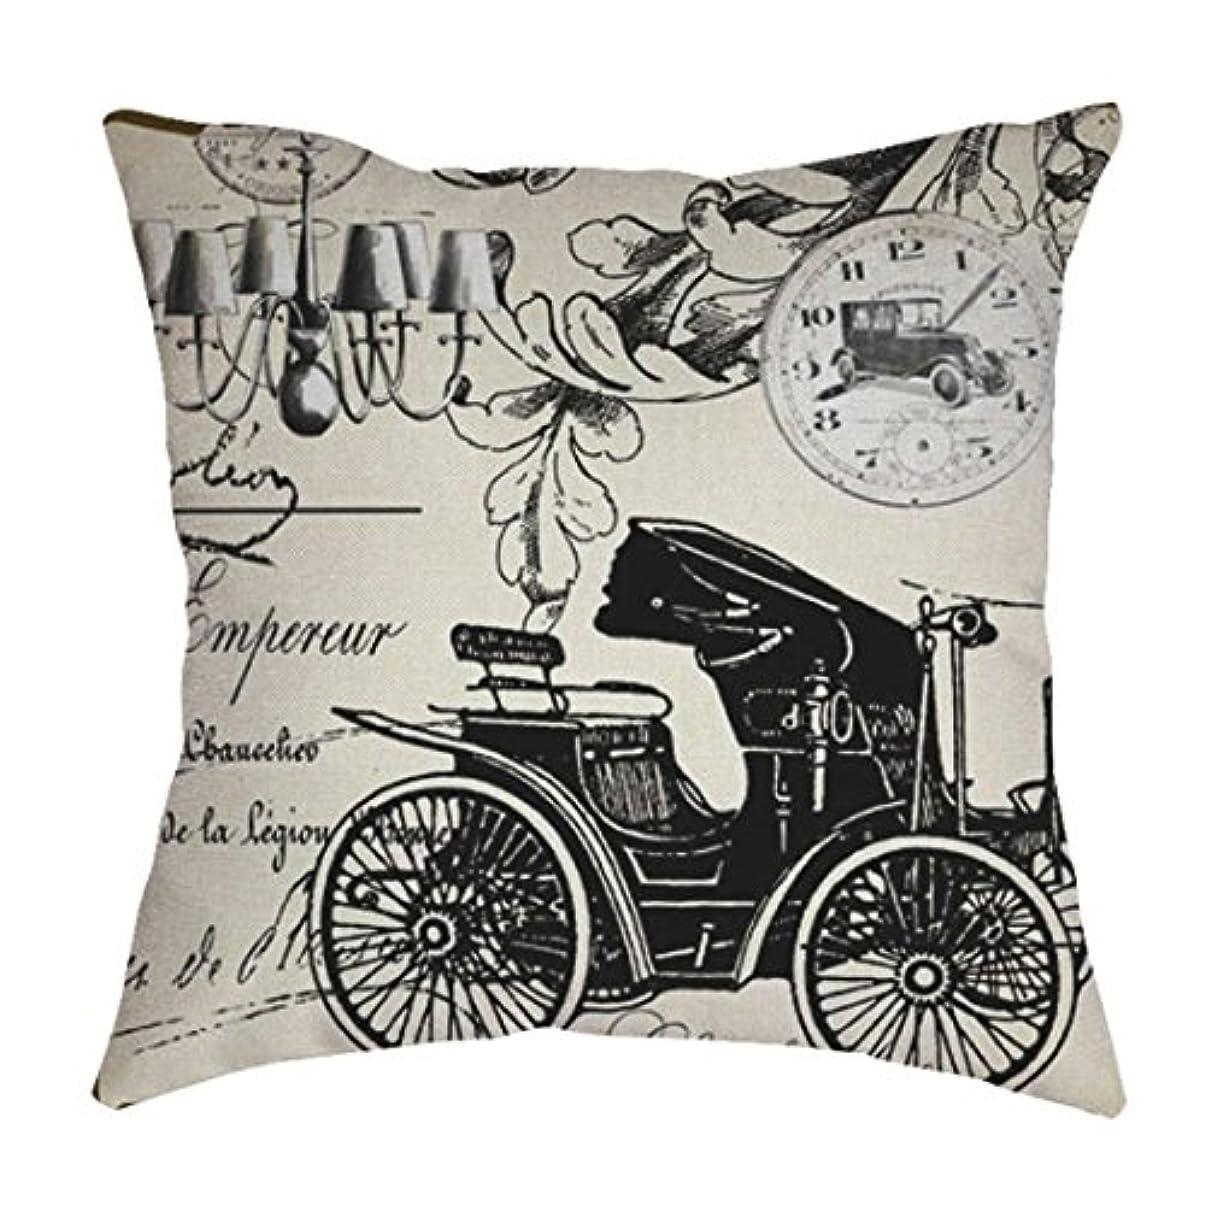 Mhomzawa クッションカバー 馬車プリント クラシック ピローケース 抱き枕カバー 可愛い 装飾 背当て お部屋 ソファー 椅子 車 正方形 装飾 おしゃれ (多色)